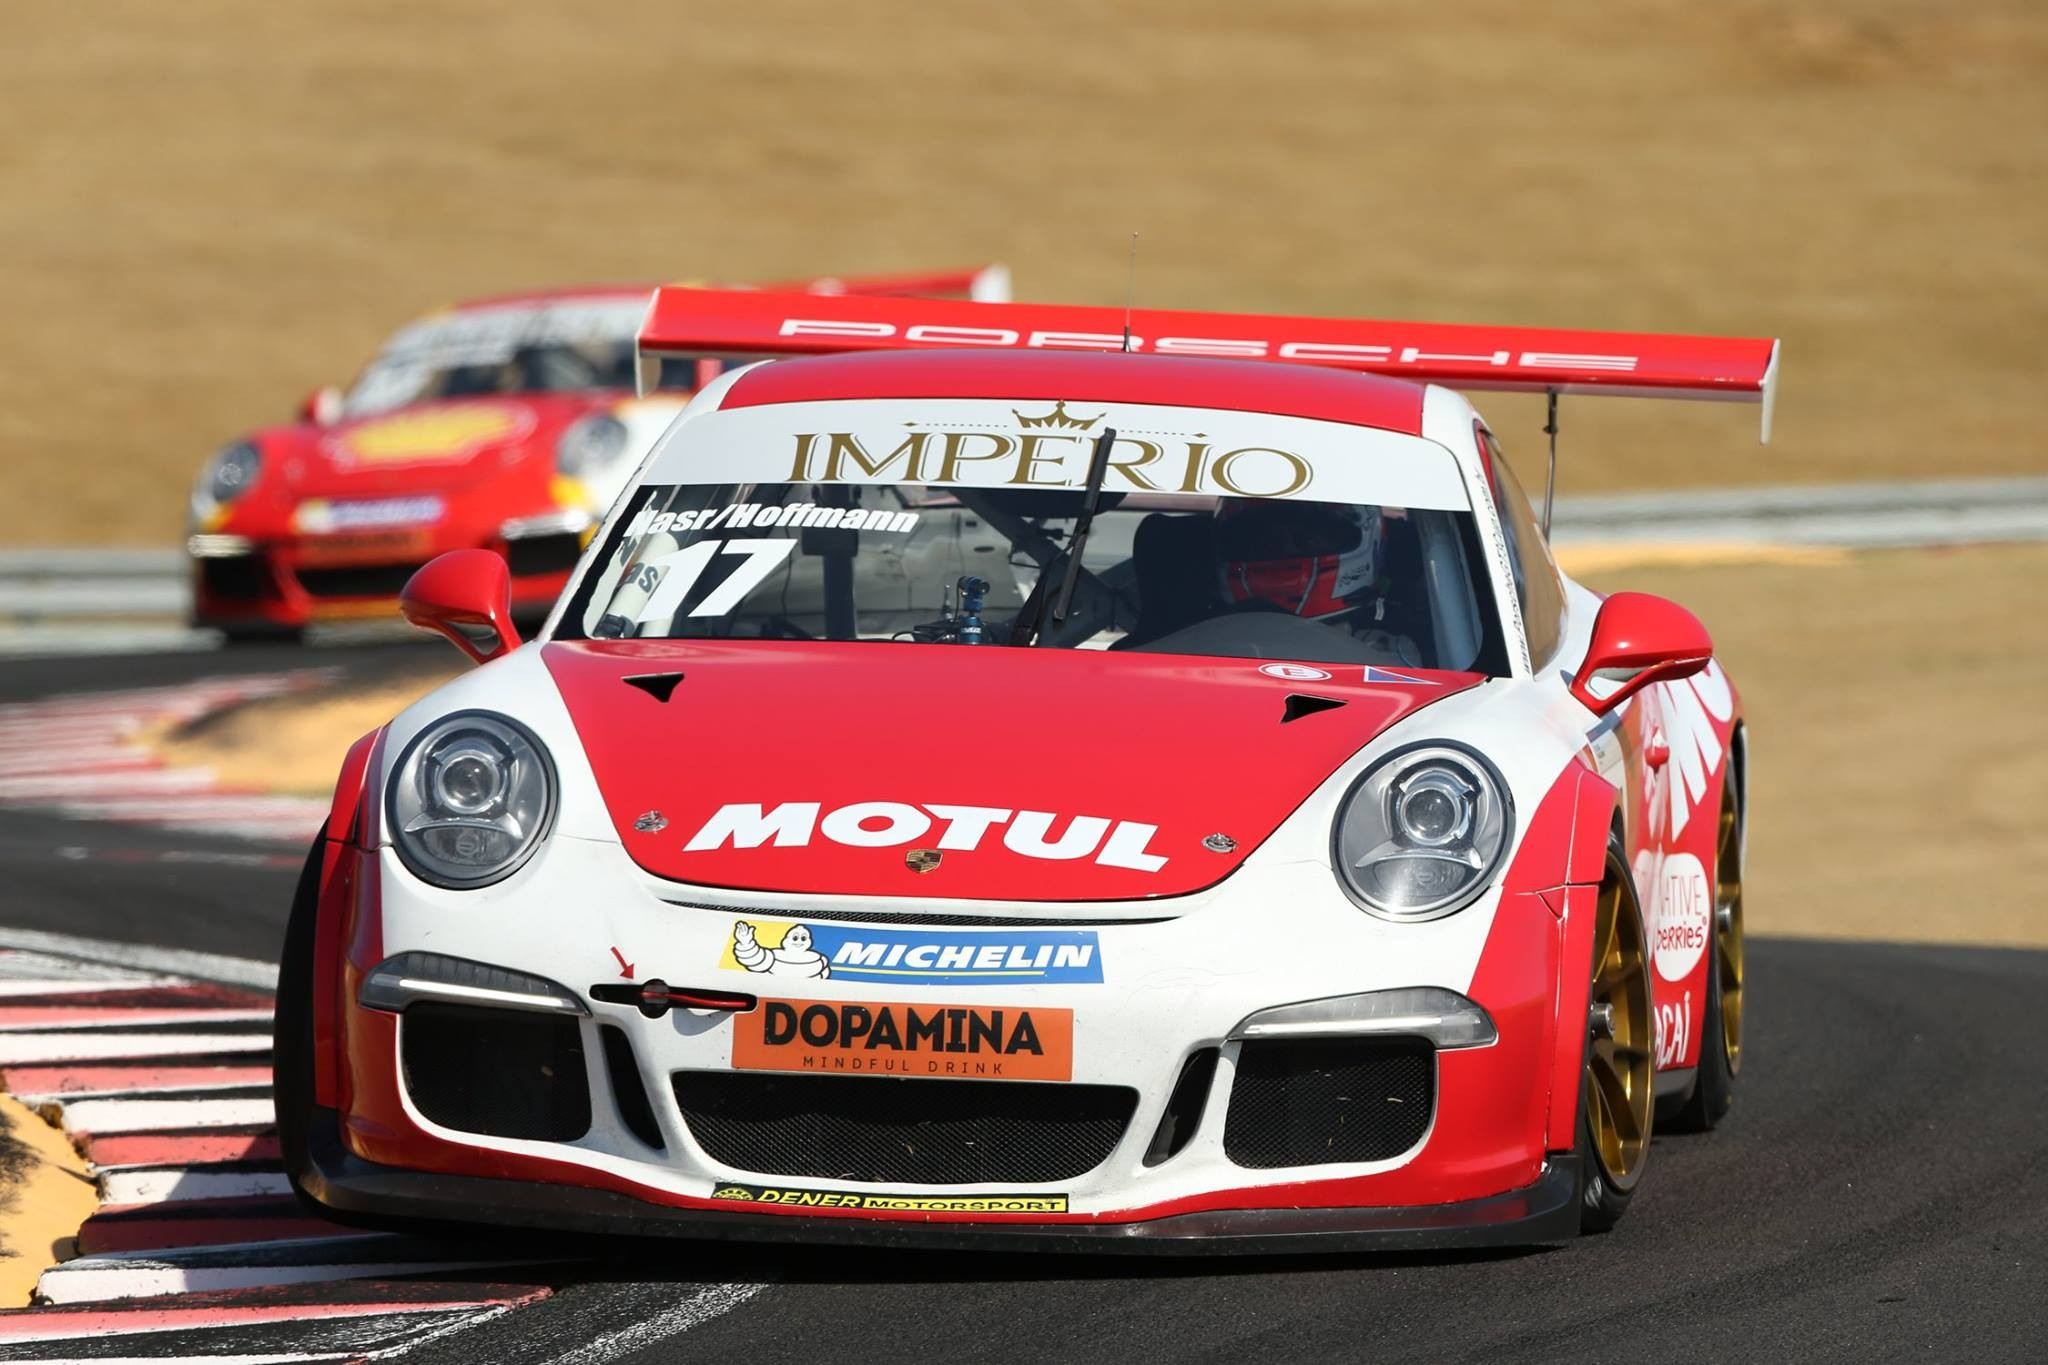 O Porsche da categoria CUP da dupla da F1,  Felipe Nasr/Ingo Hoffmann #17  (Foto: Porsche Império GT3 Cup/Luca Bassani)